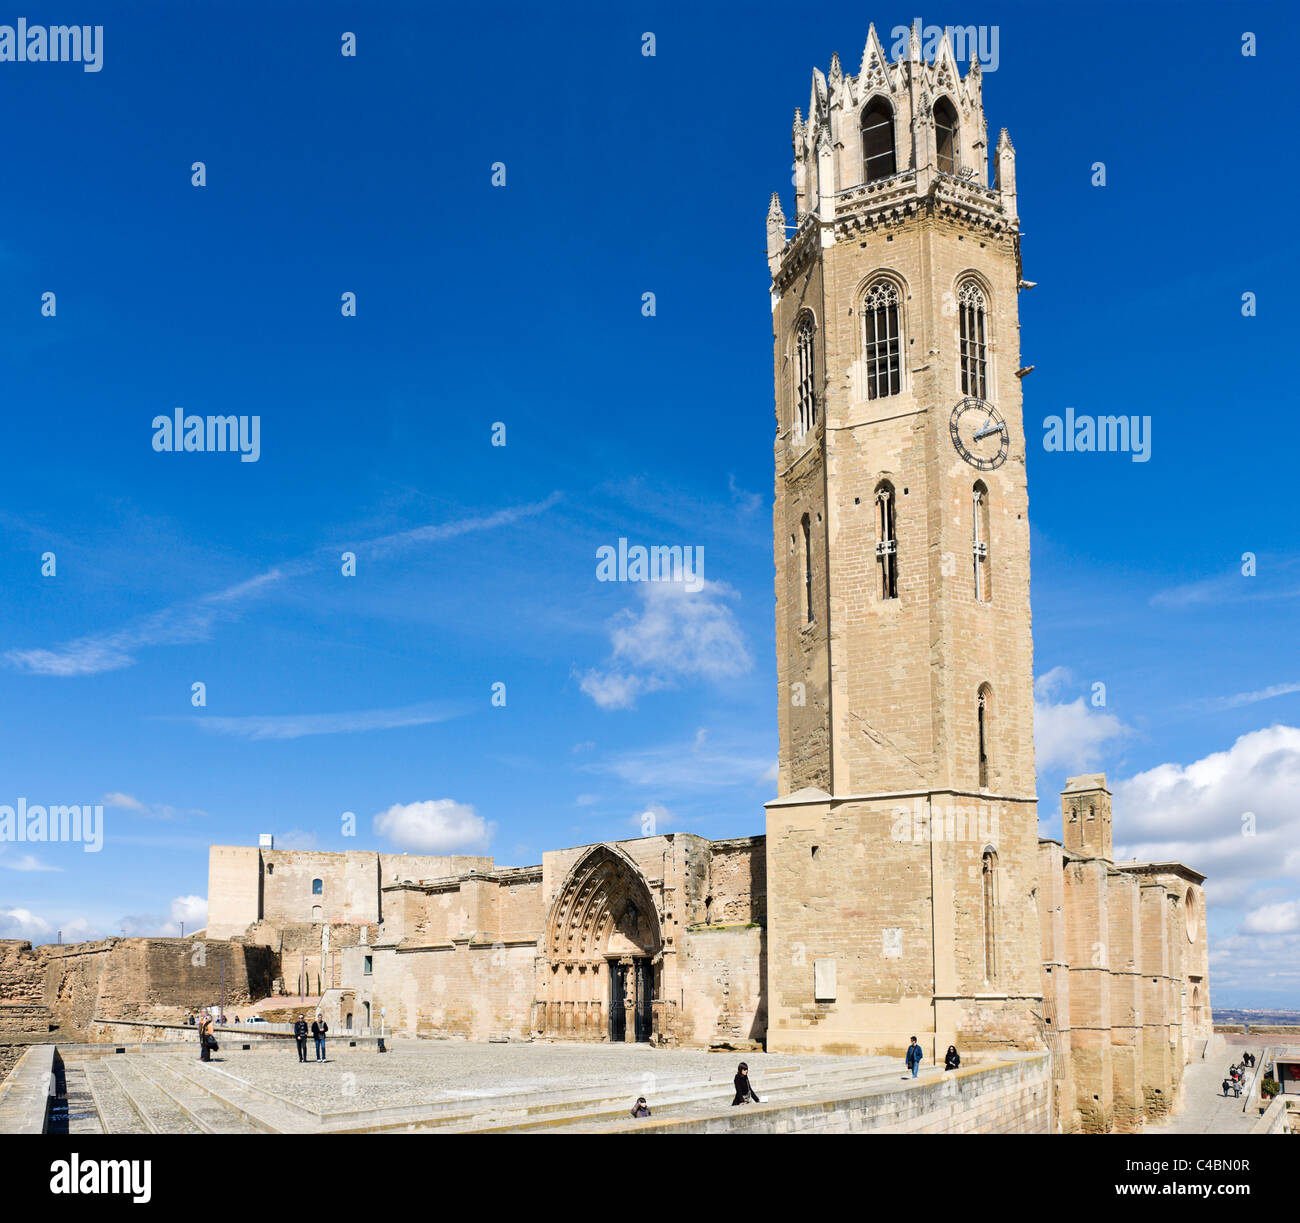 The Seu Vella (Old Cathedral), Lleida (Lerida), Catalunya, Spain - Stock Image